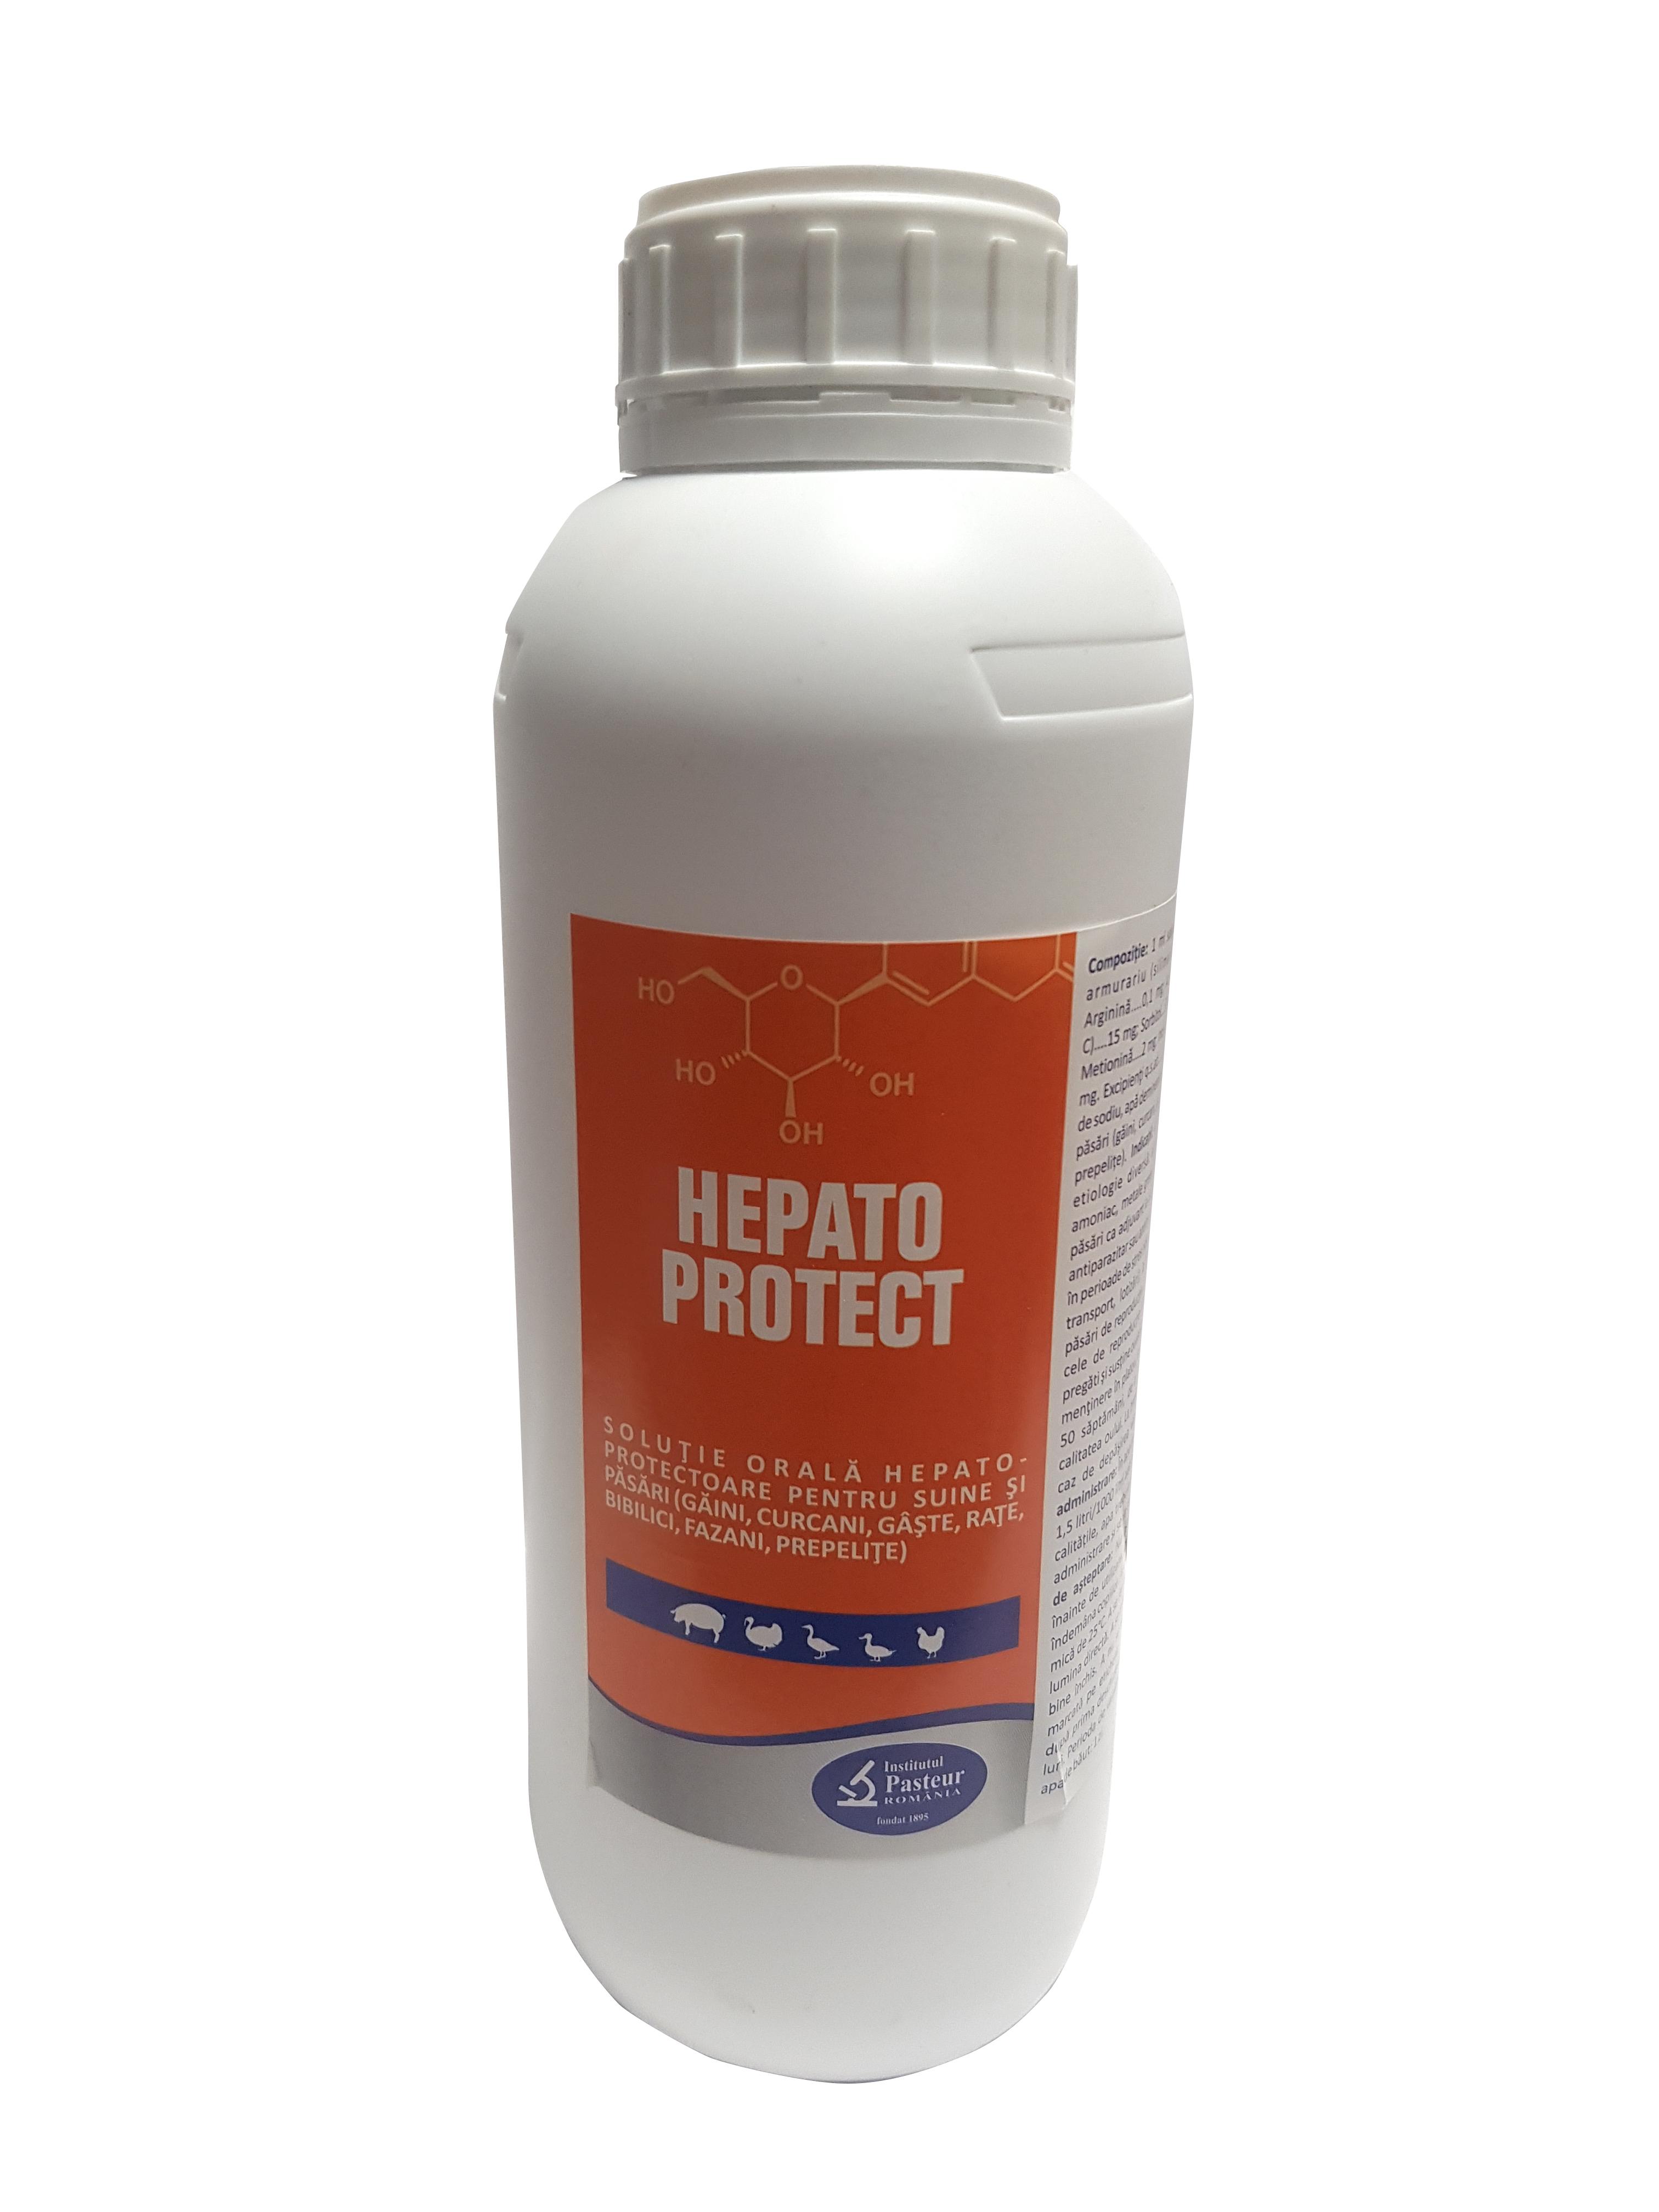 Solutie orala hepato-protectoare pentru suine si pasari, Hepato Protect, Pasteur, 1L 0